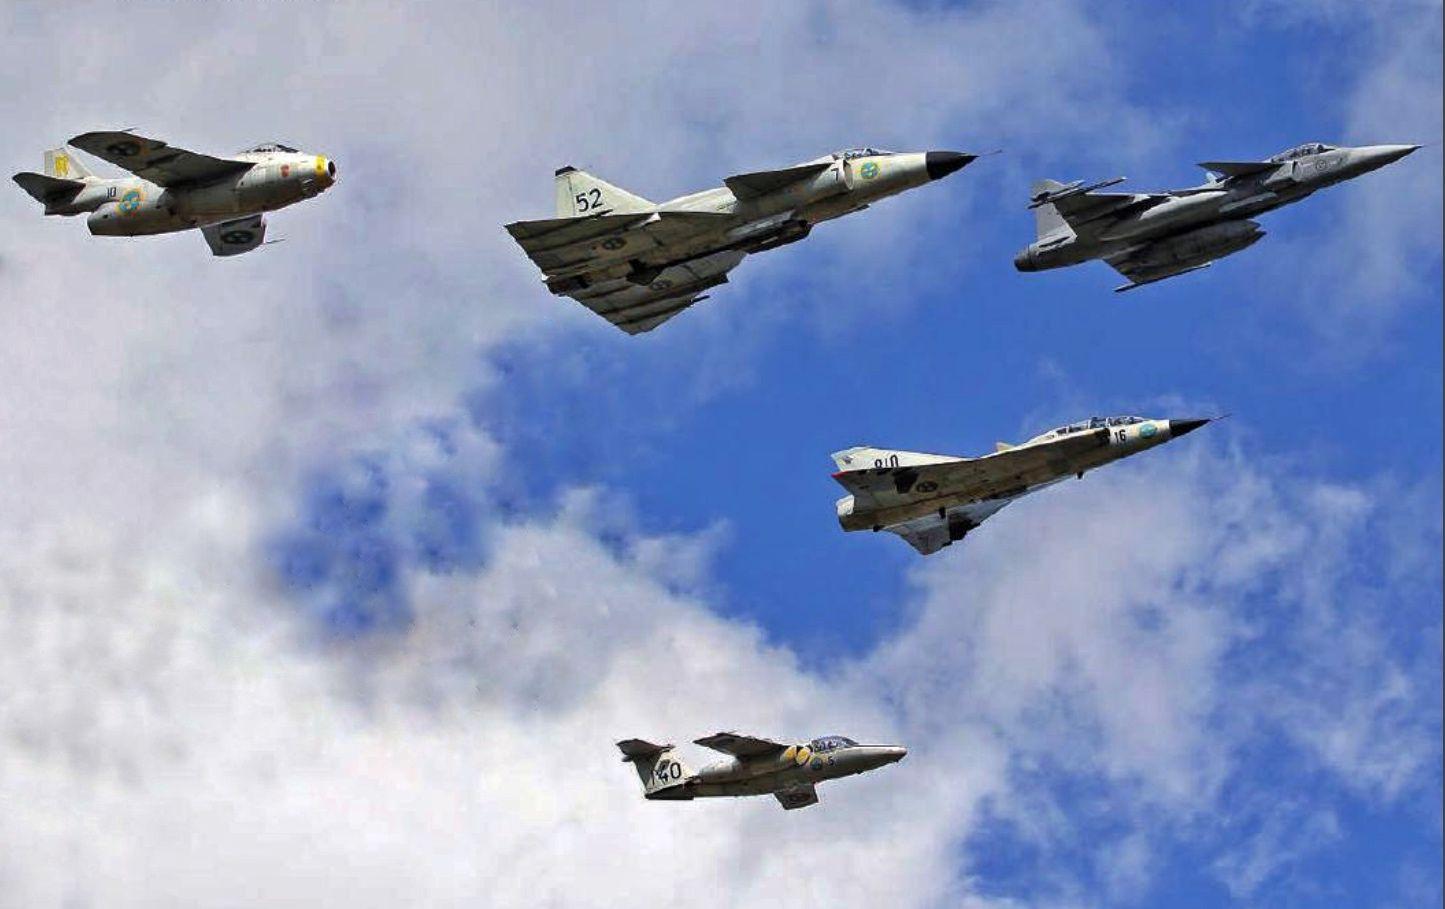 Swedish fighters